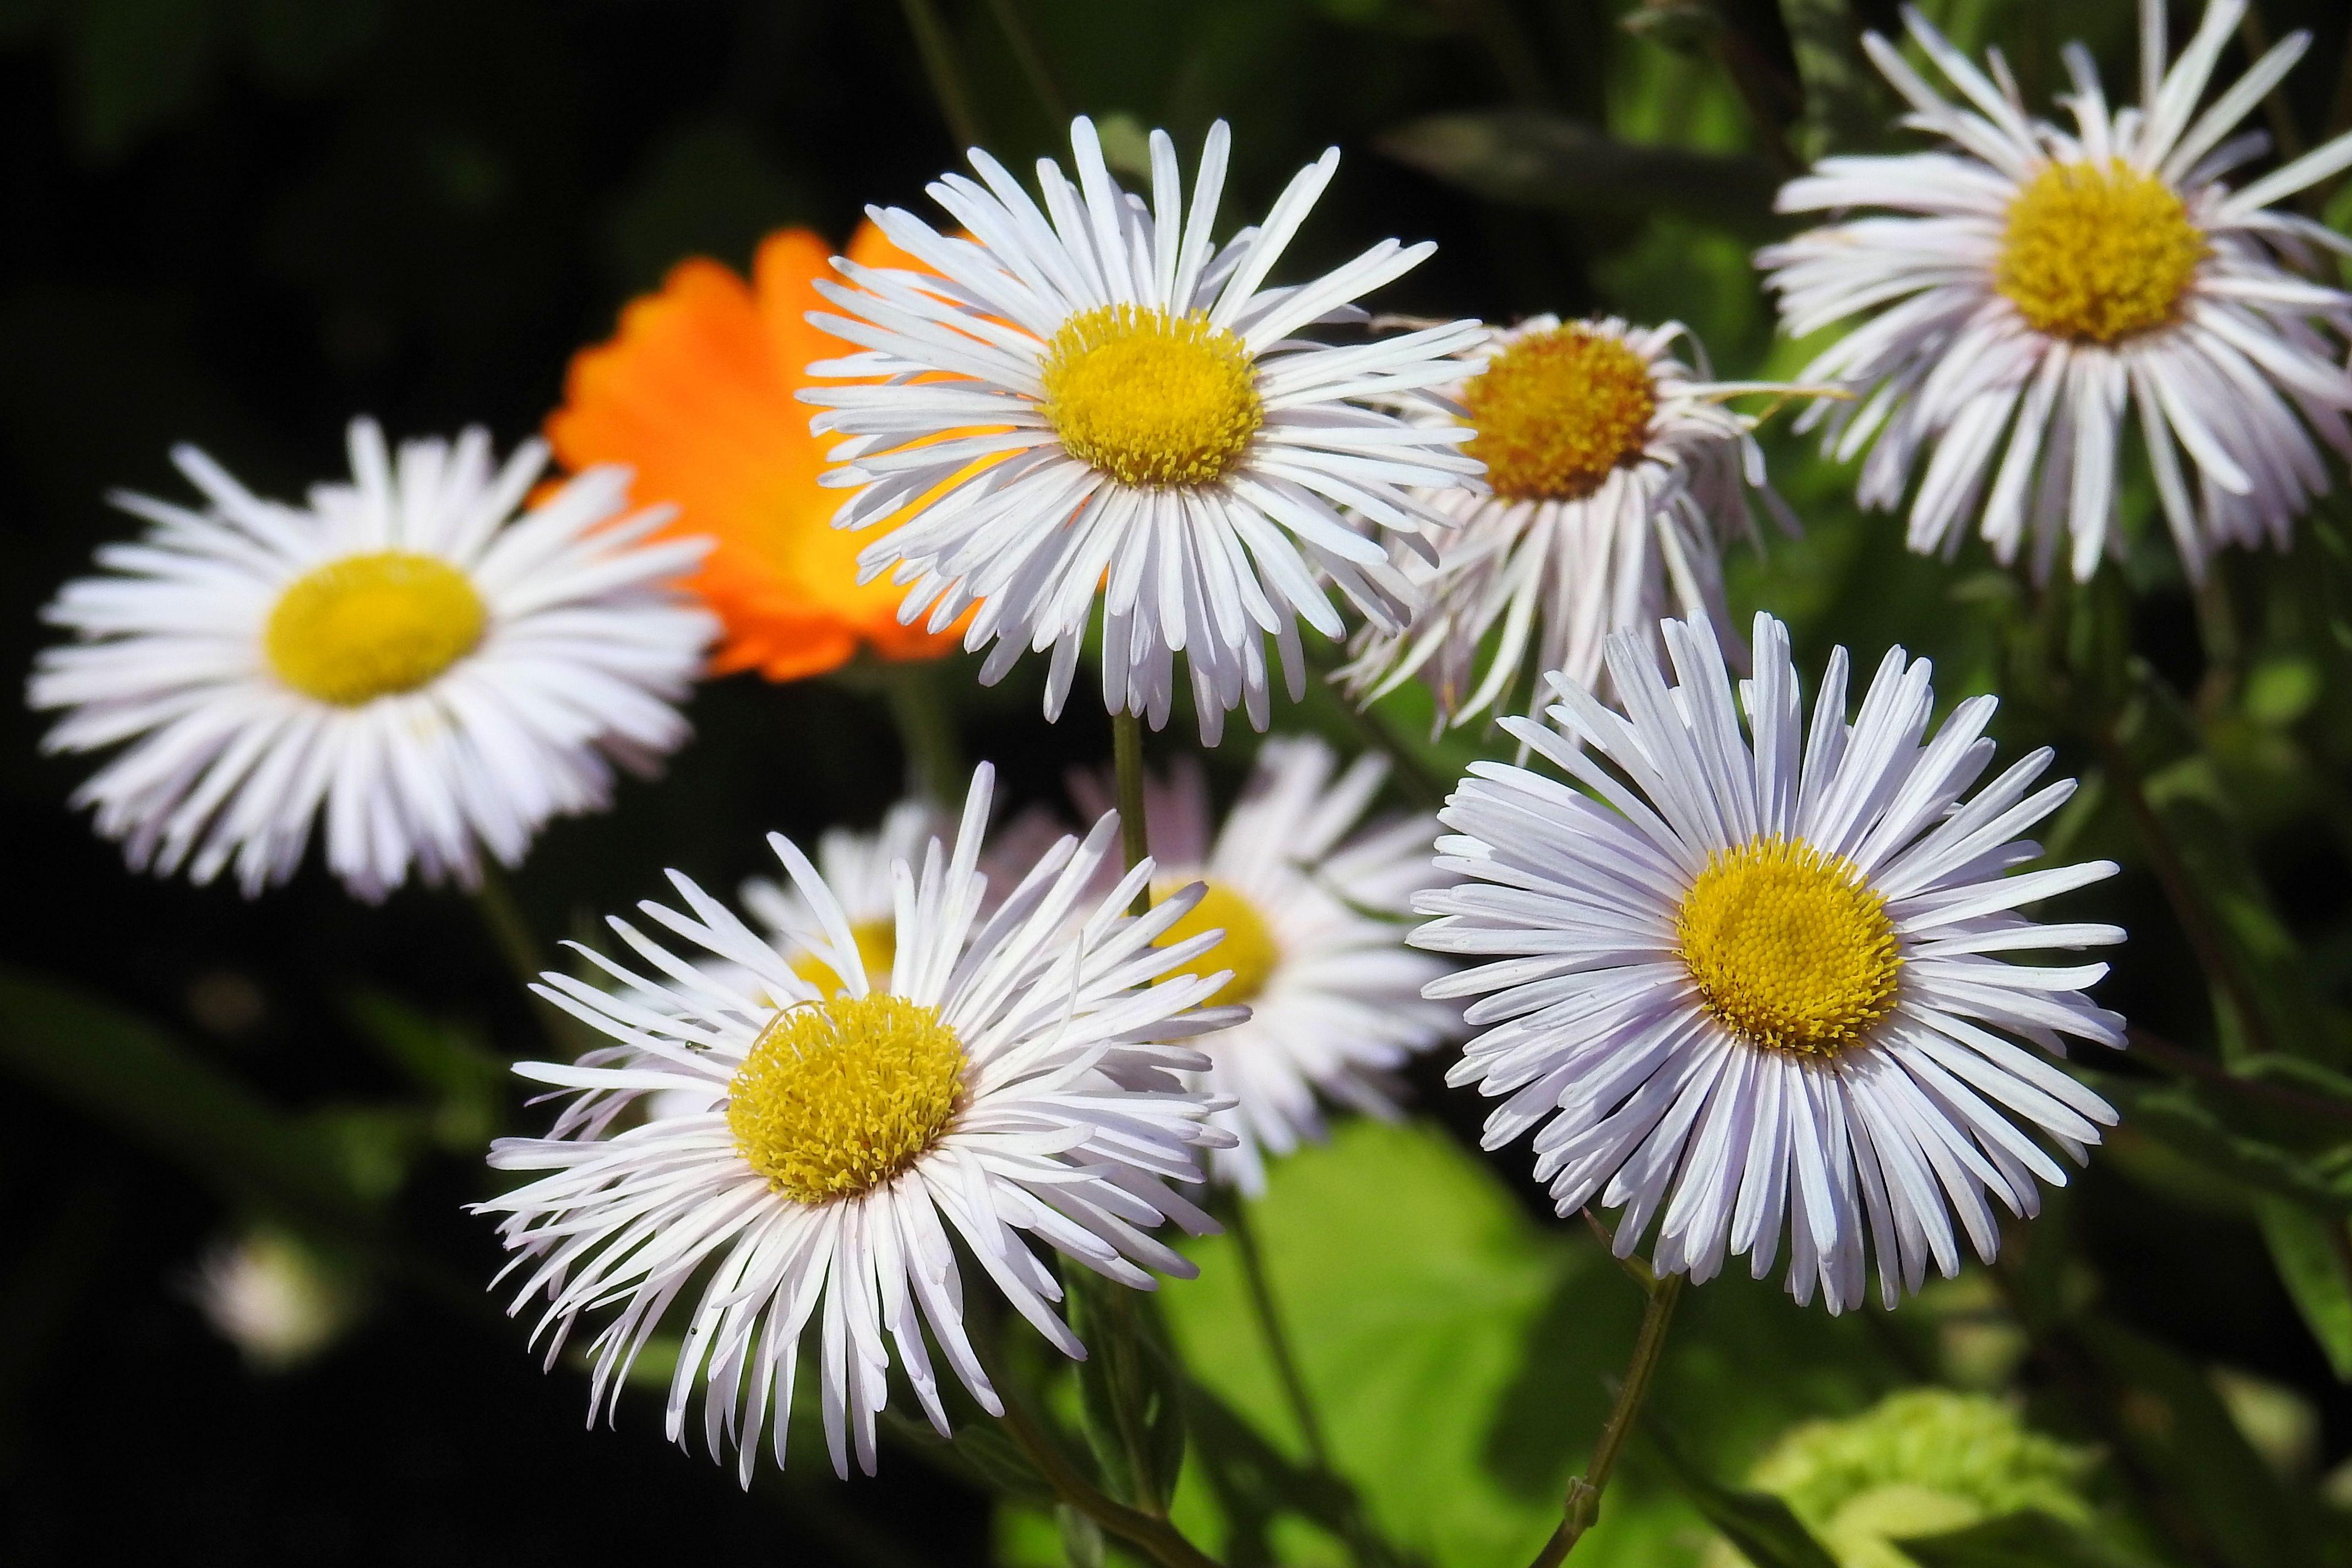 Free Images Flower Petal Botany Flora Wildflower Aster